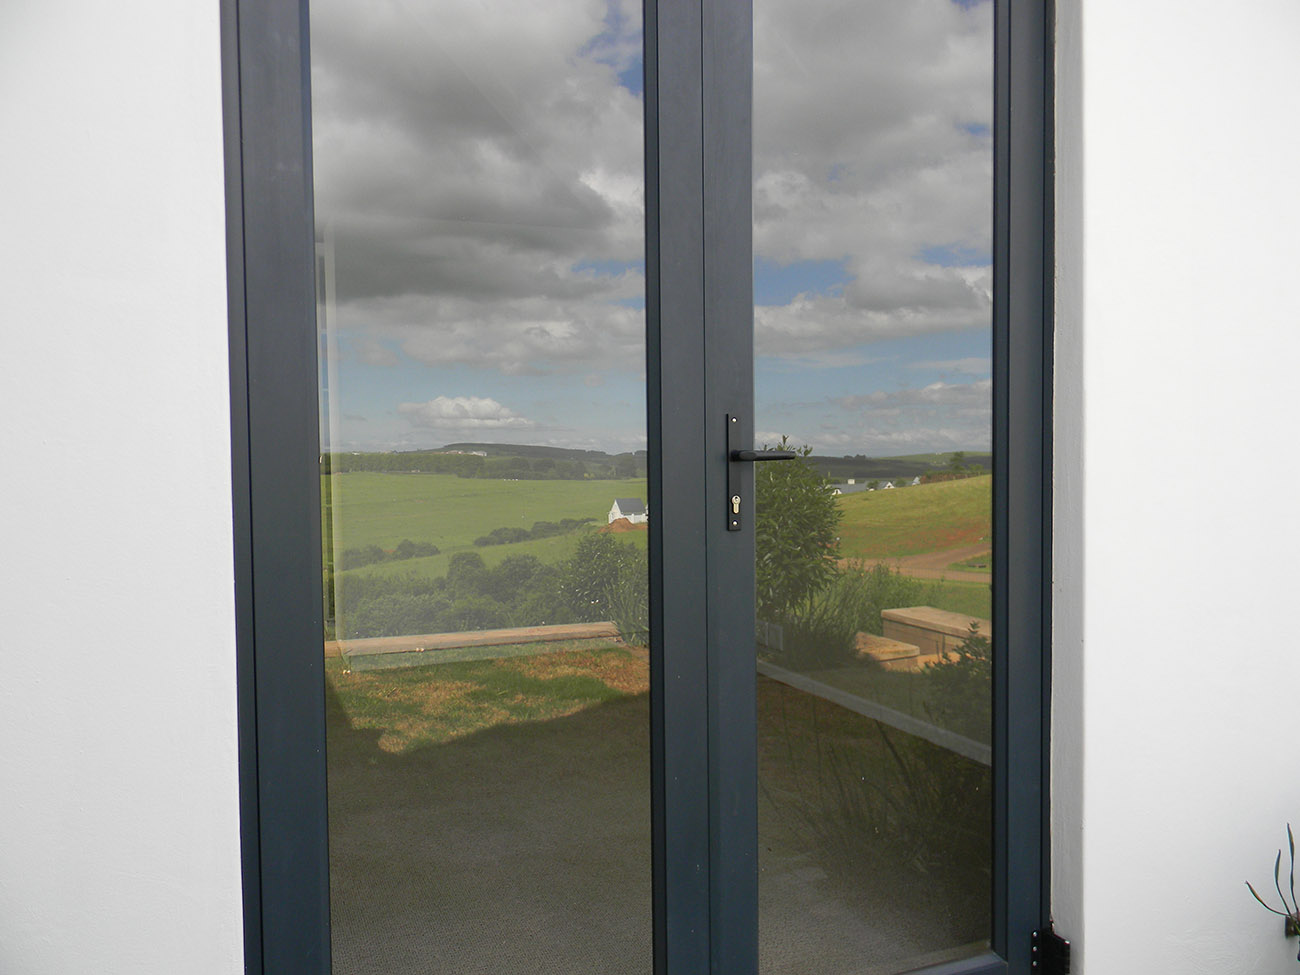 friendly-town-house-for-let-garlington-estate-luxury-country-living-estate-kzn-hilton-midlands